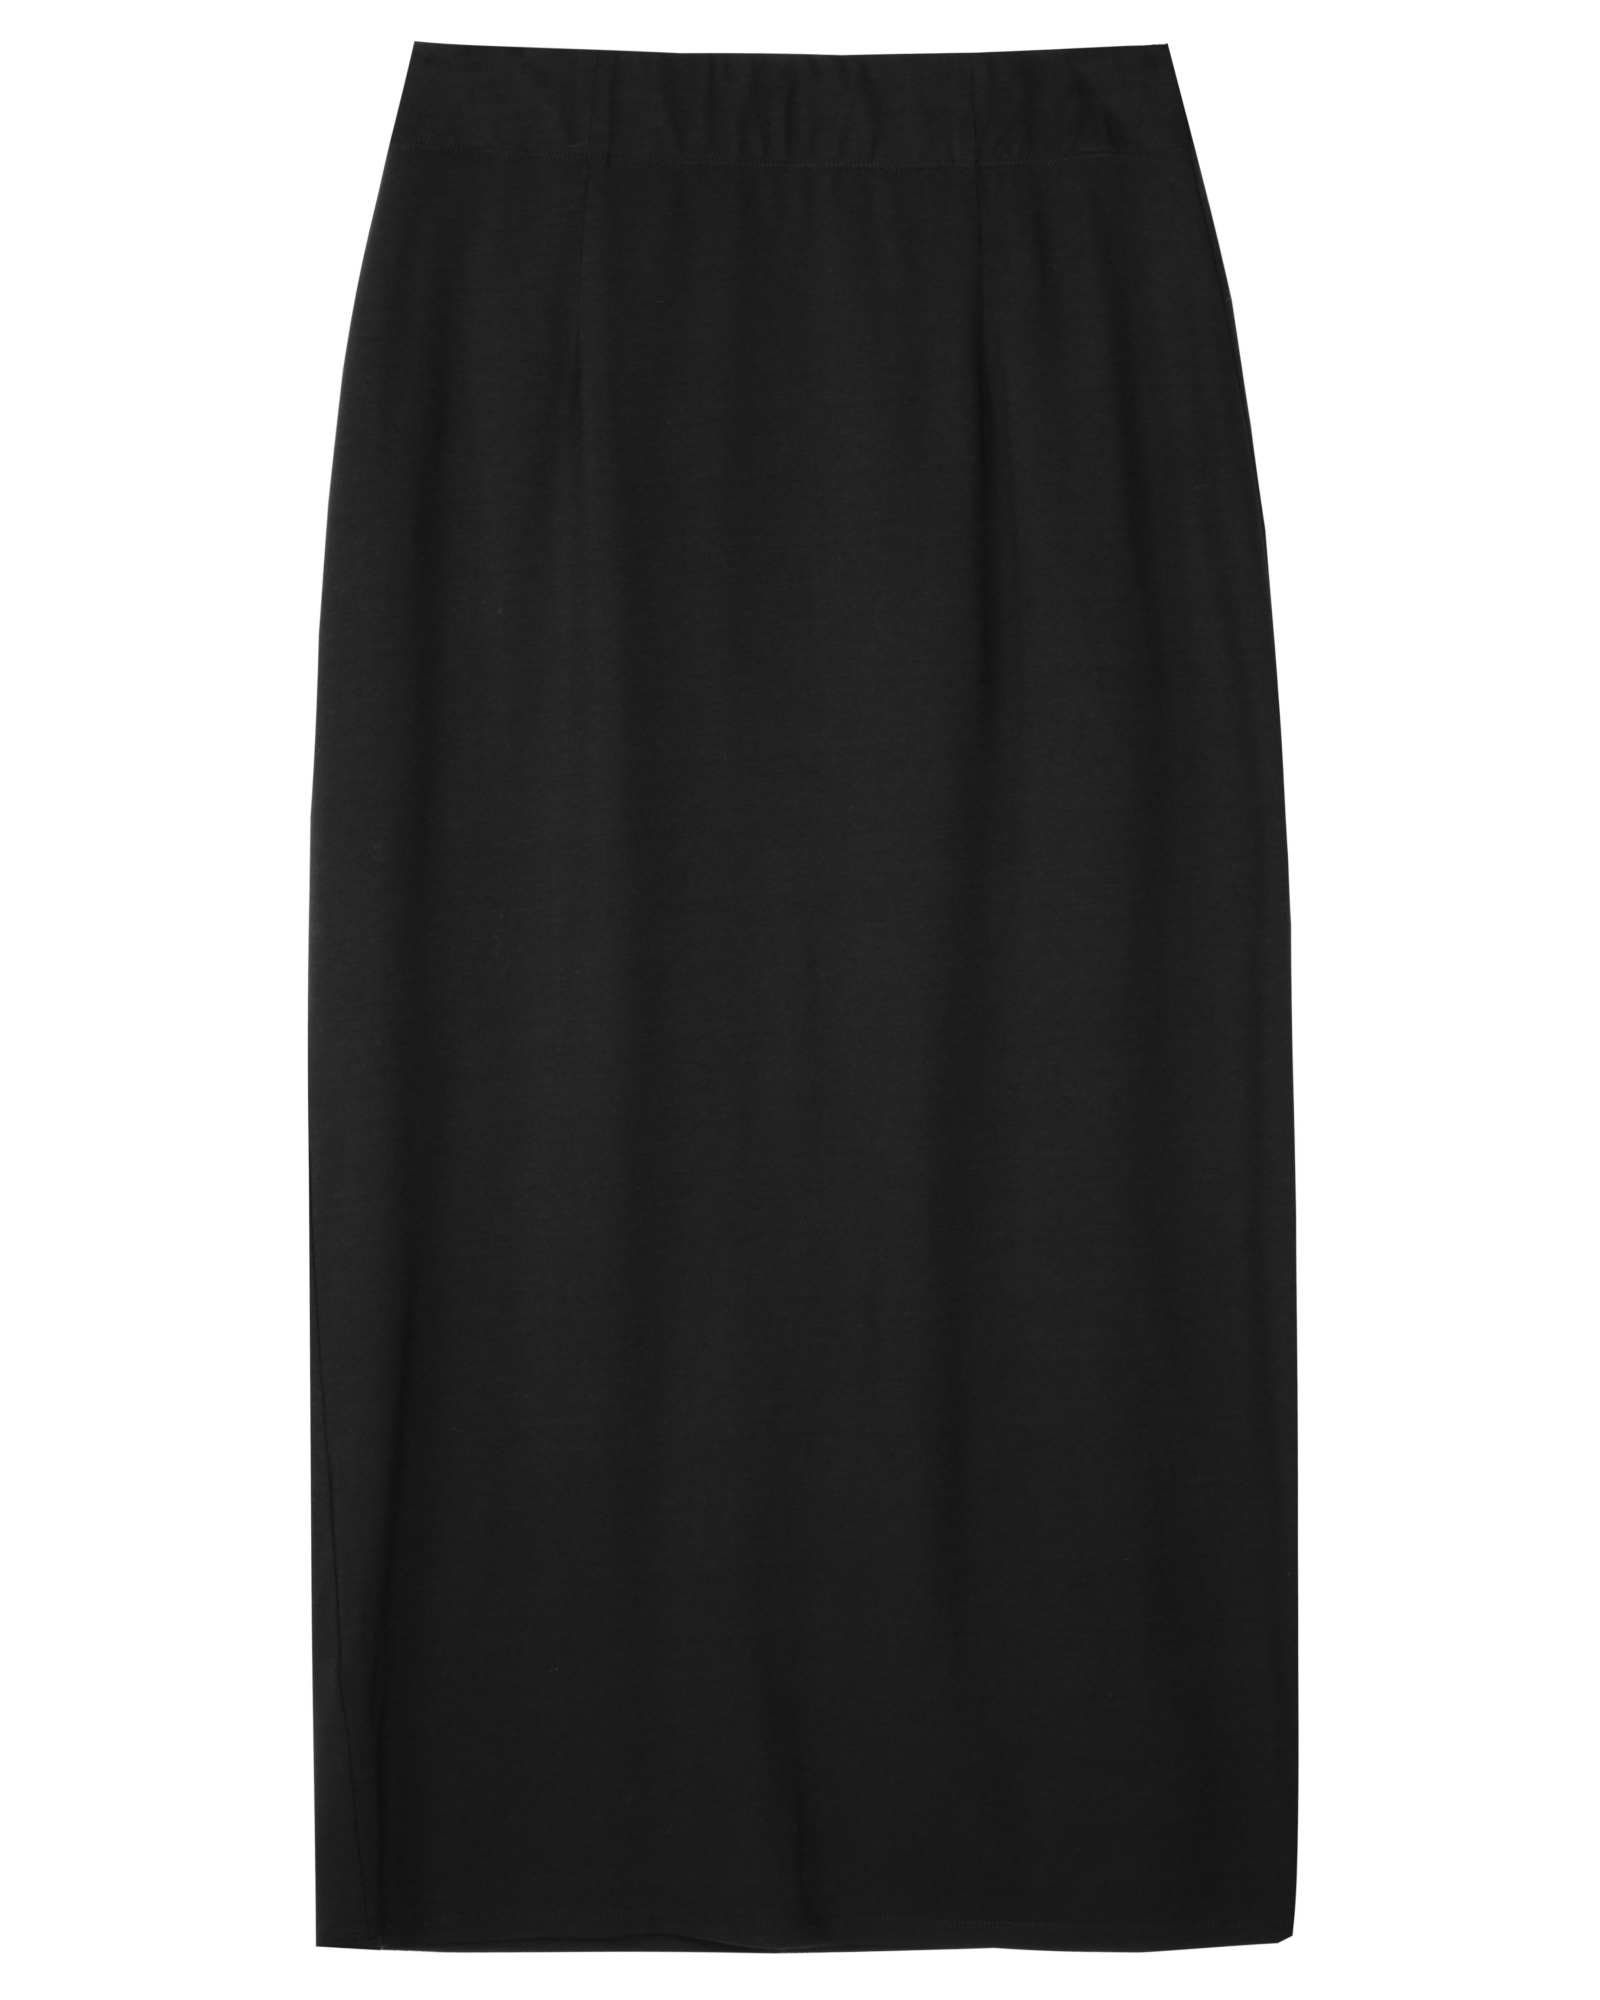 Rayon Stretch Skirt